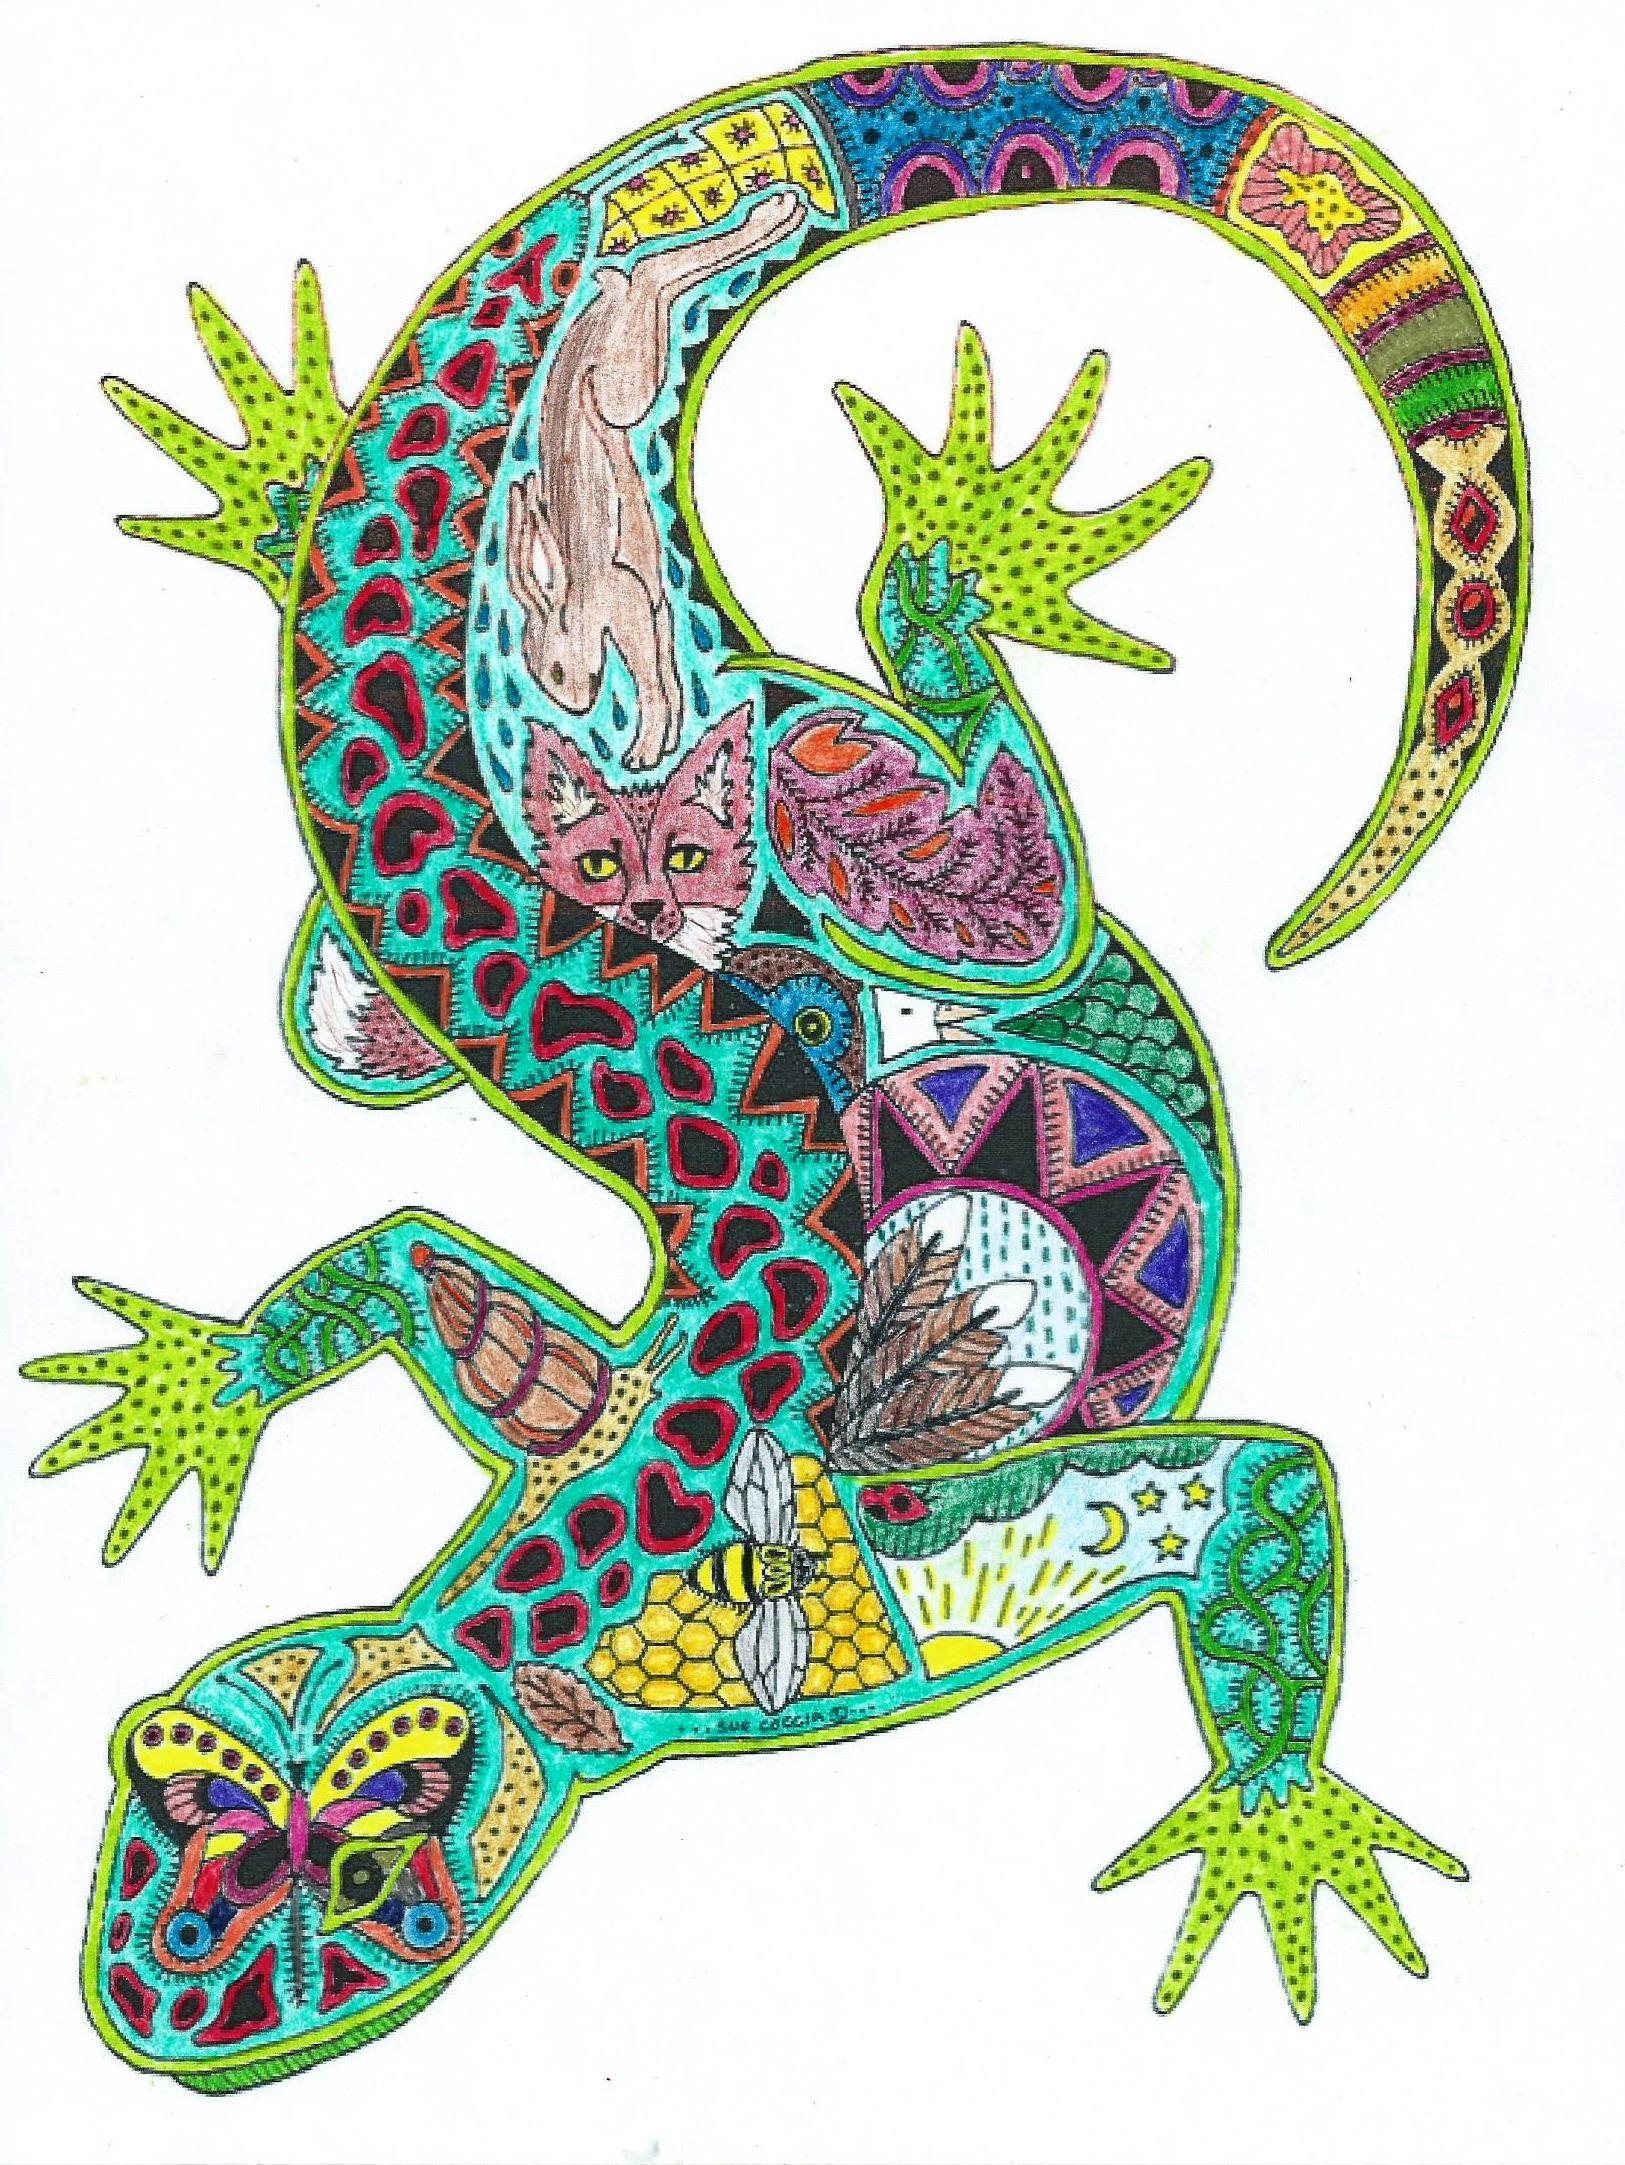 lizard beautiful animals pinterest lizards zentangles and mandalas. Black Bedroom Furniture Sets. Home Design Ideas